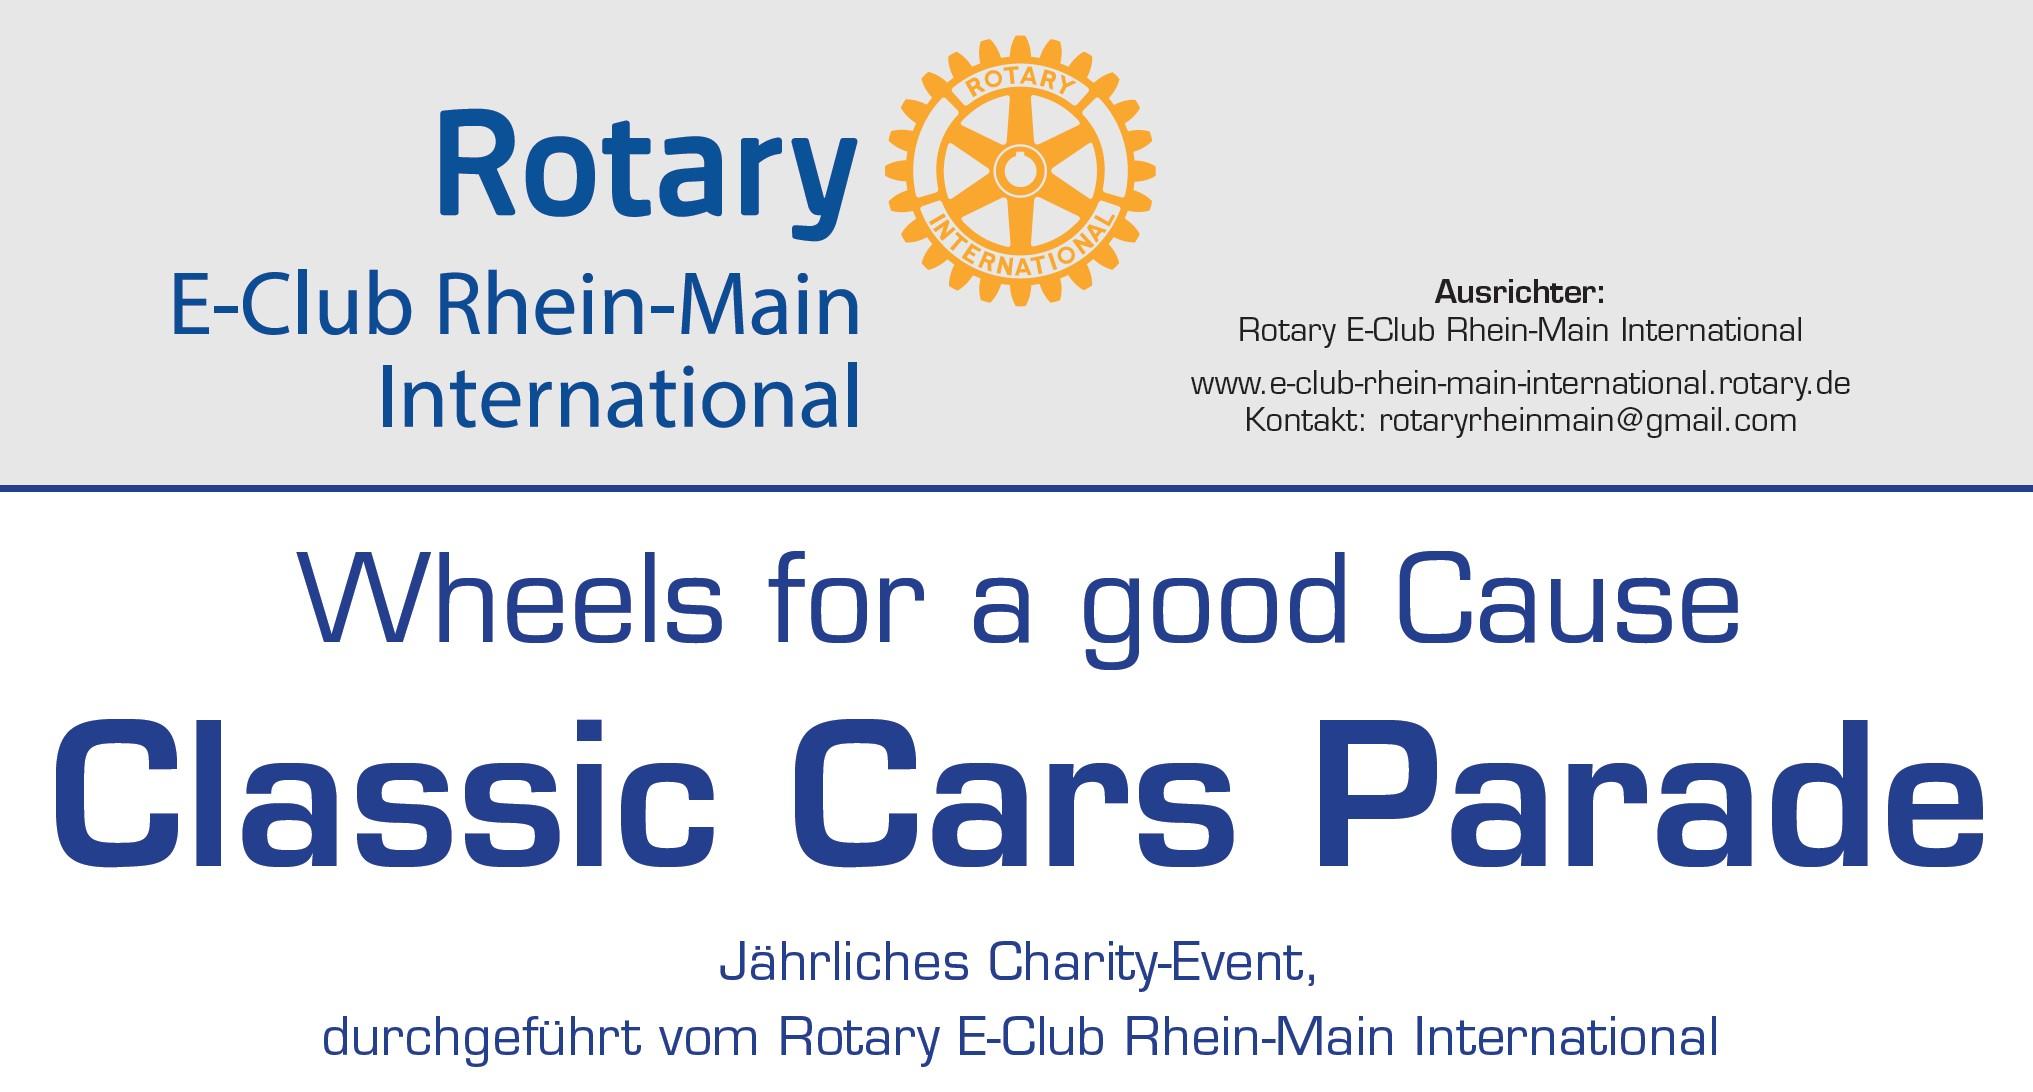 Rotary RMI Classic Cars Parade 2020 in Alzenau